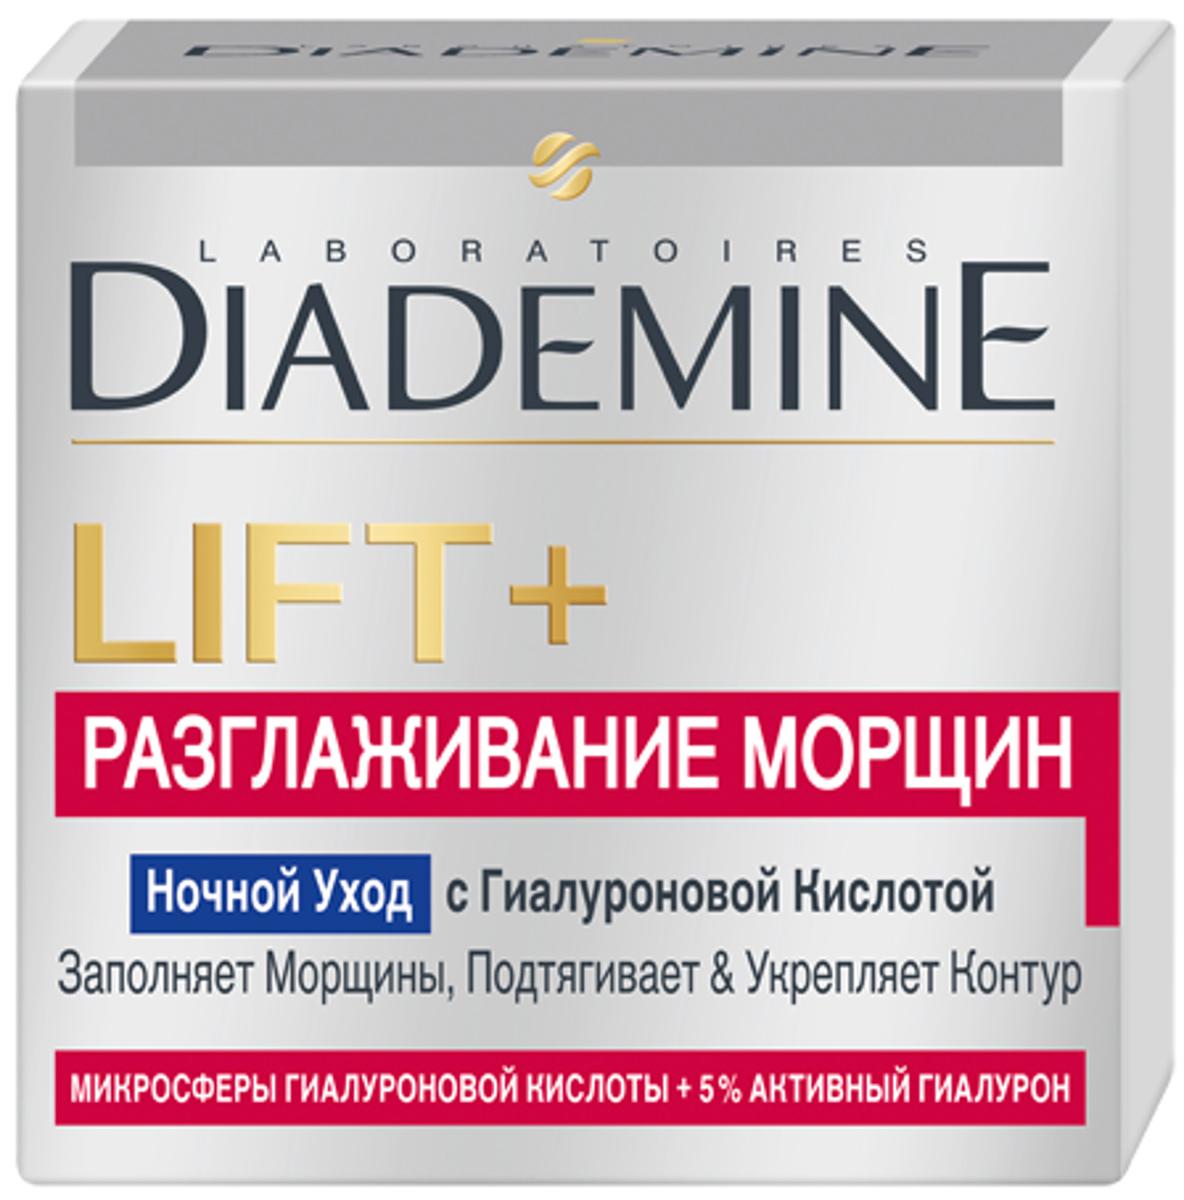 DIADEMINE LIFT+ Superfiller Разглаживание морщин Ночной крем, 50мл